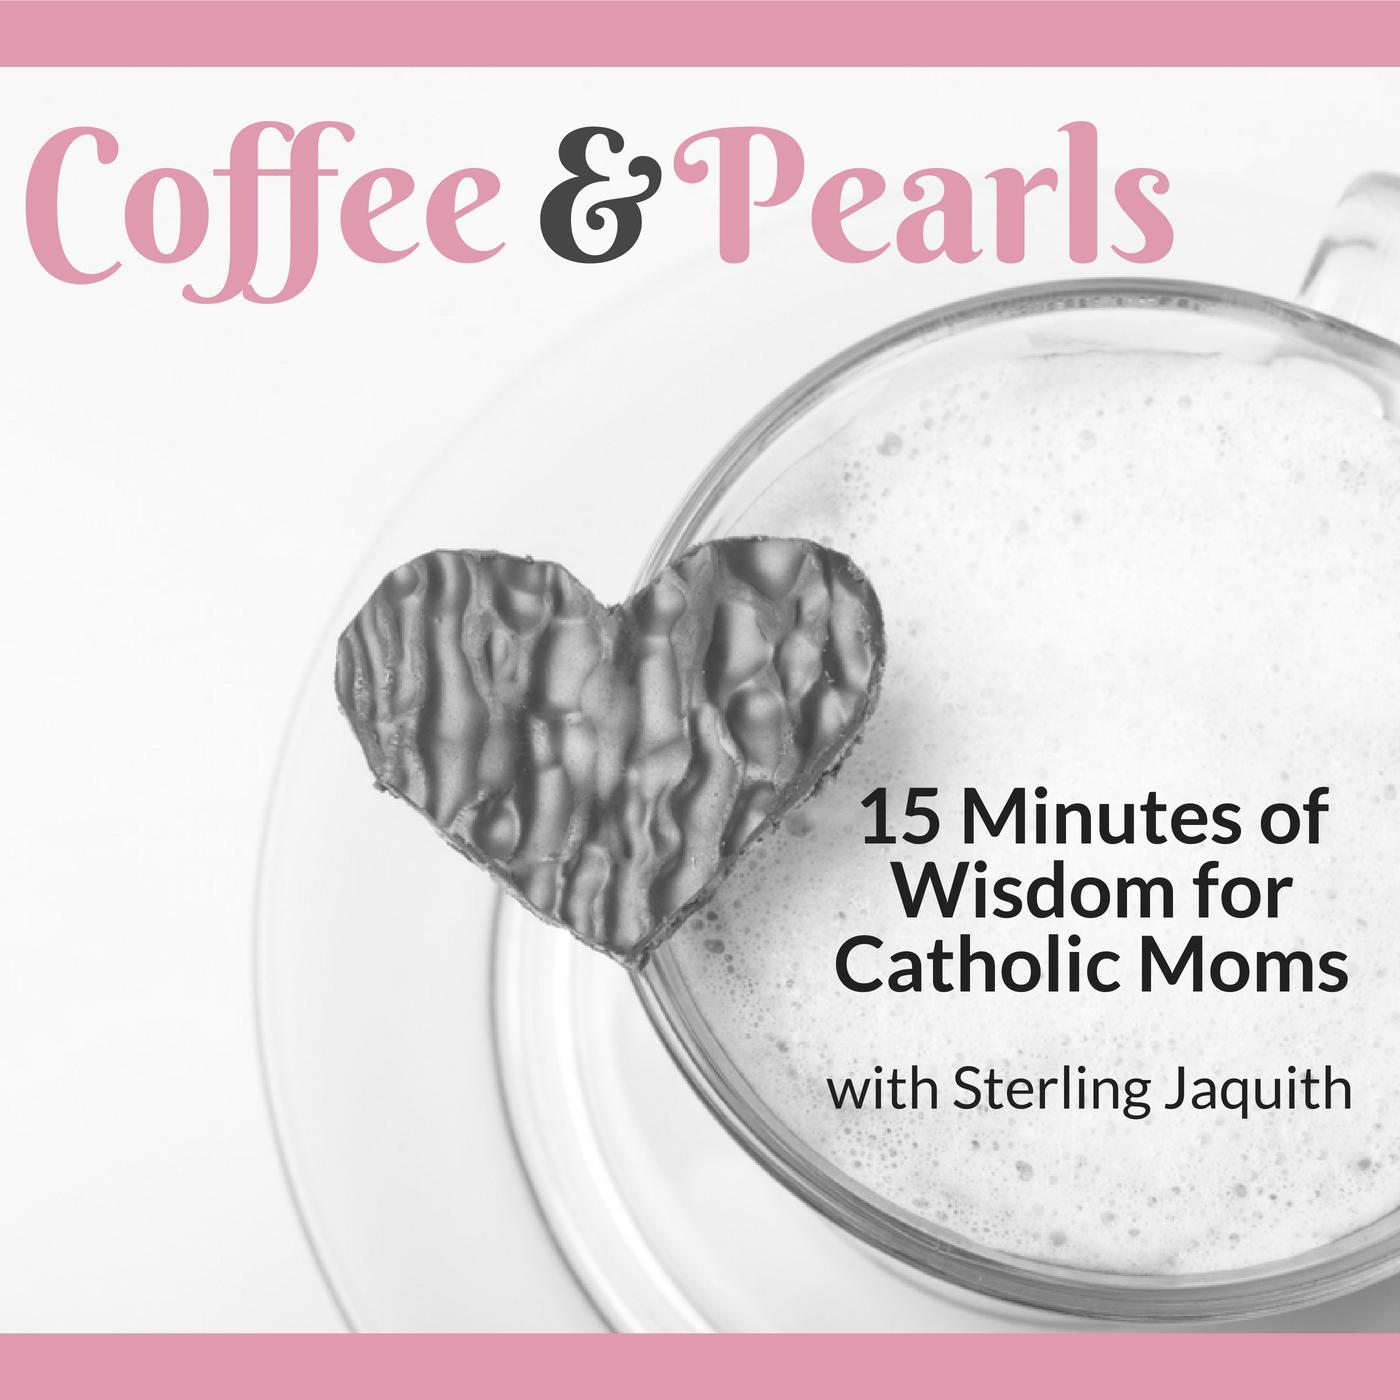 Coffee & Pearls: Wisdom for Catholic Moms show art